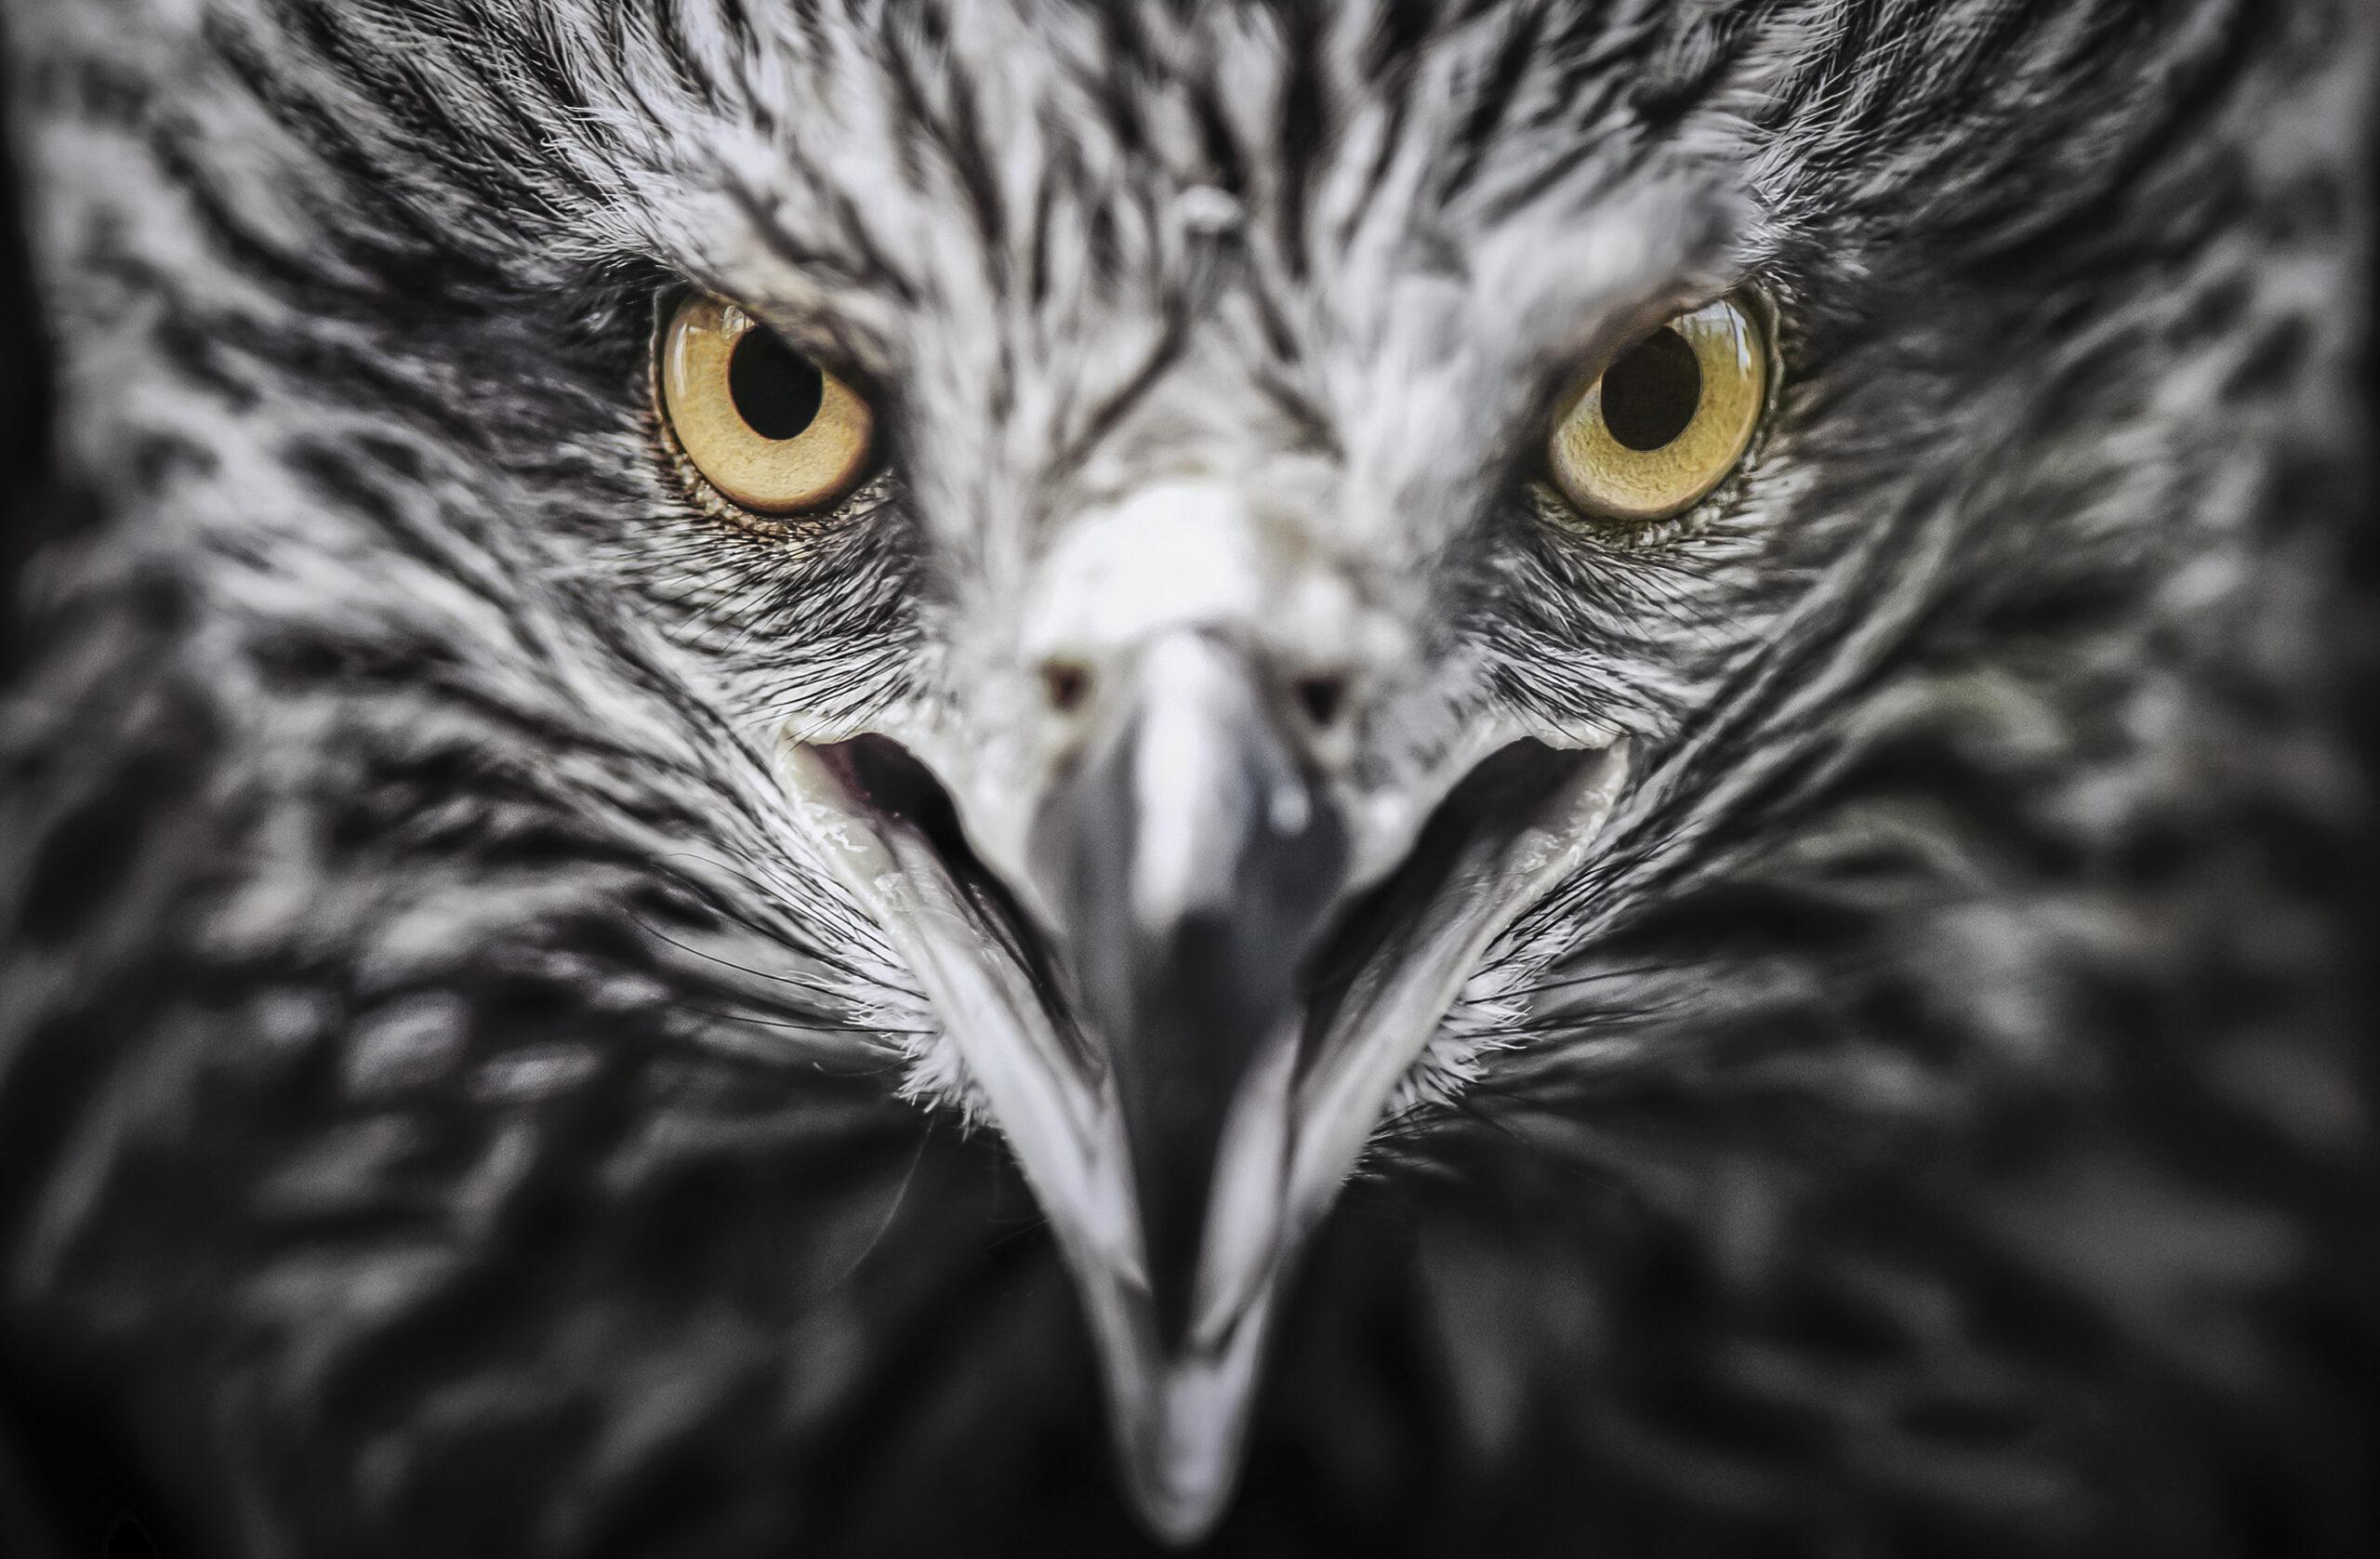 Eyes of a kite